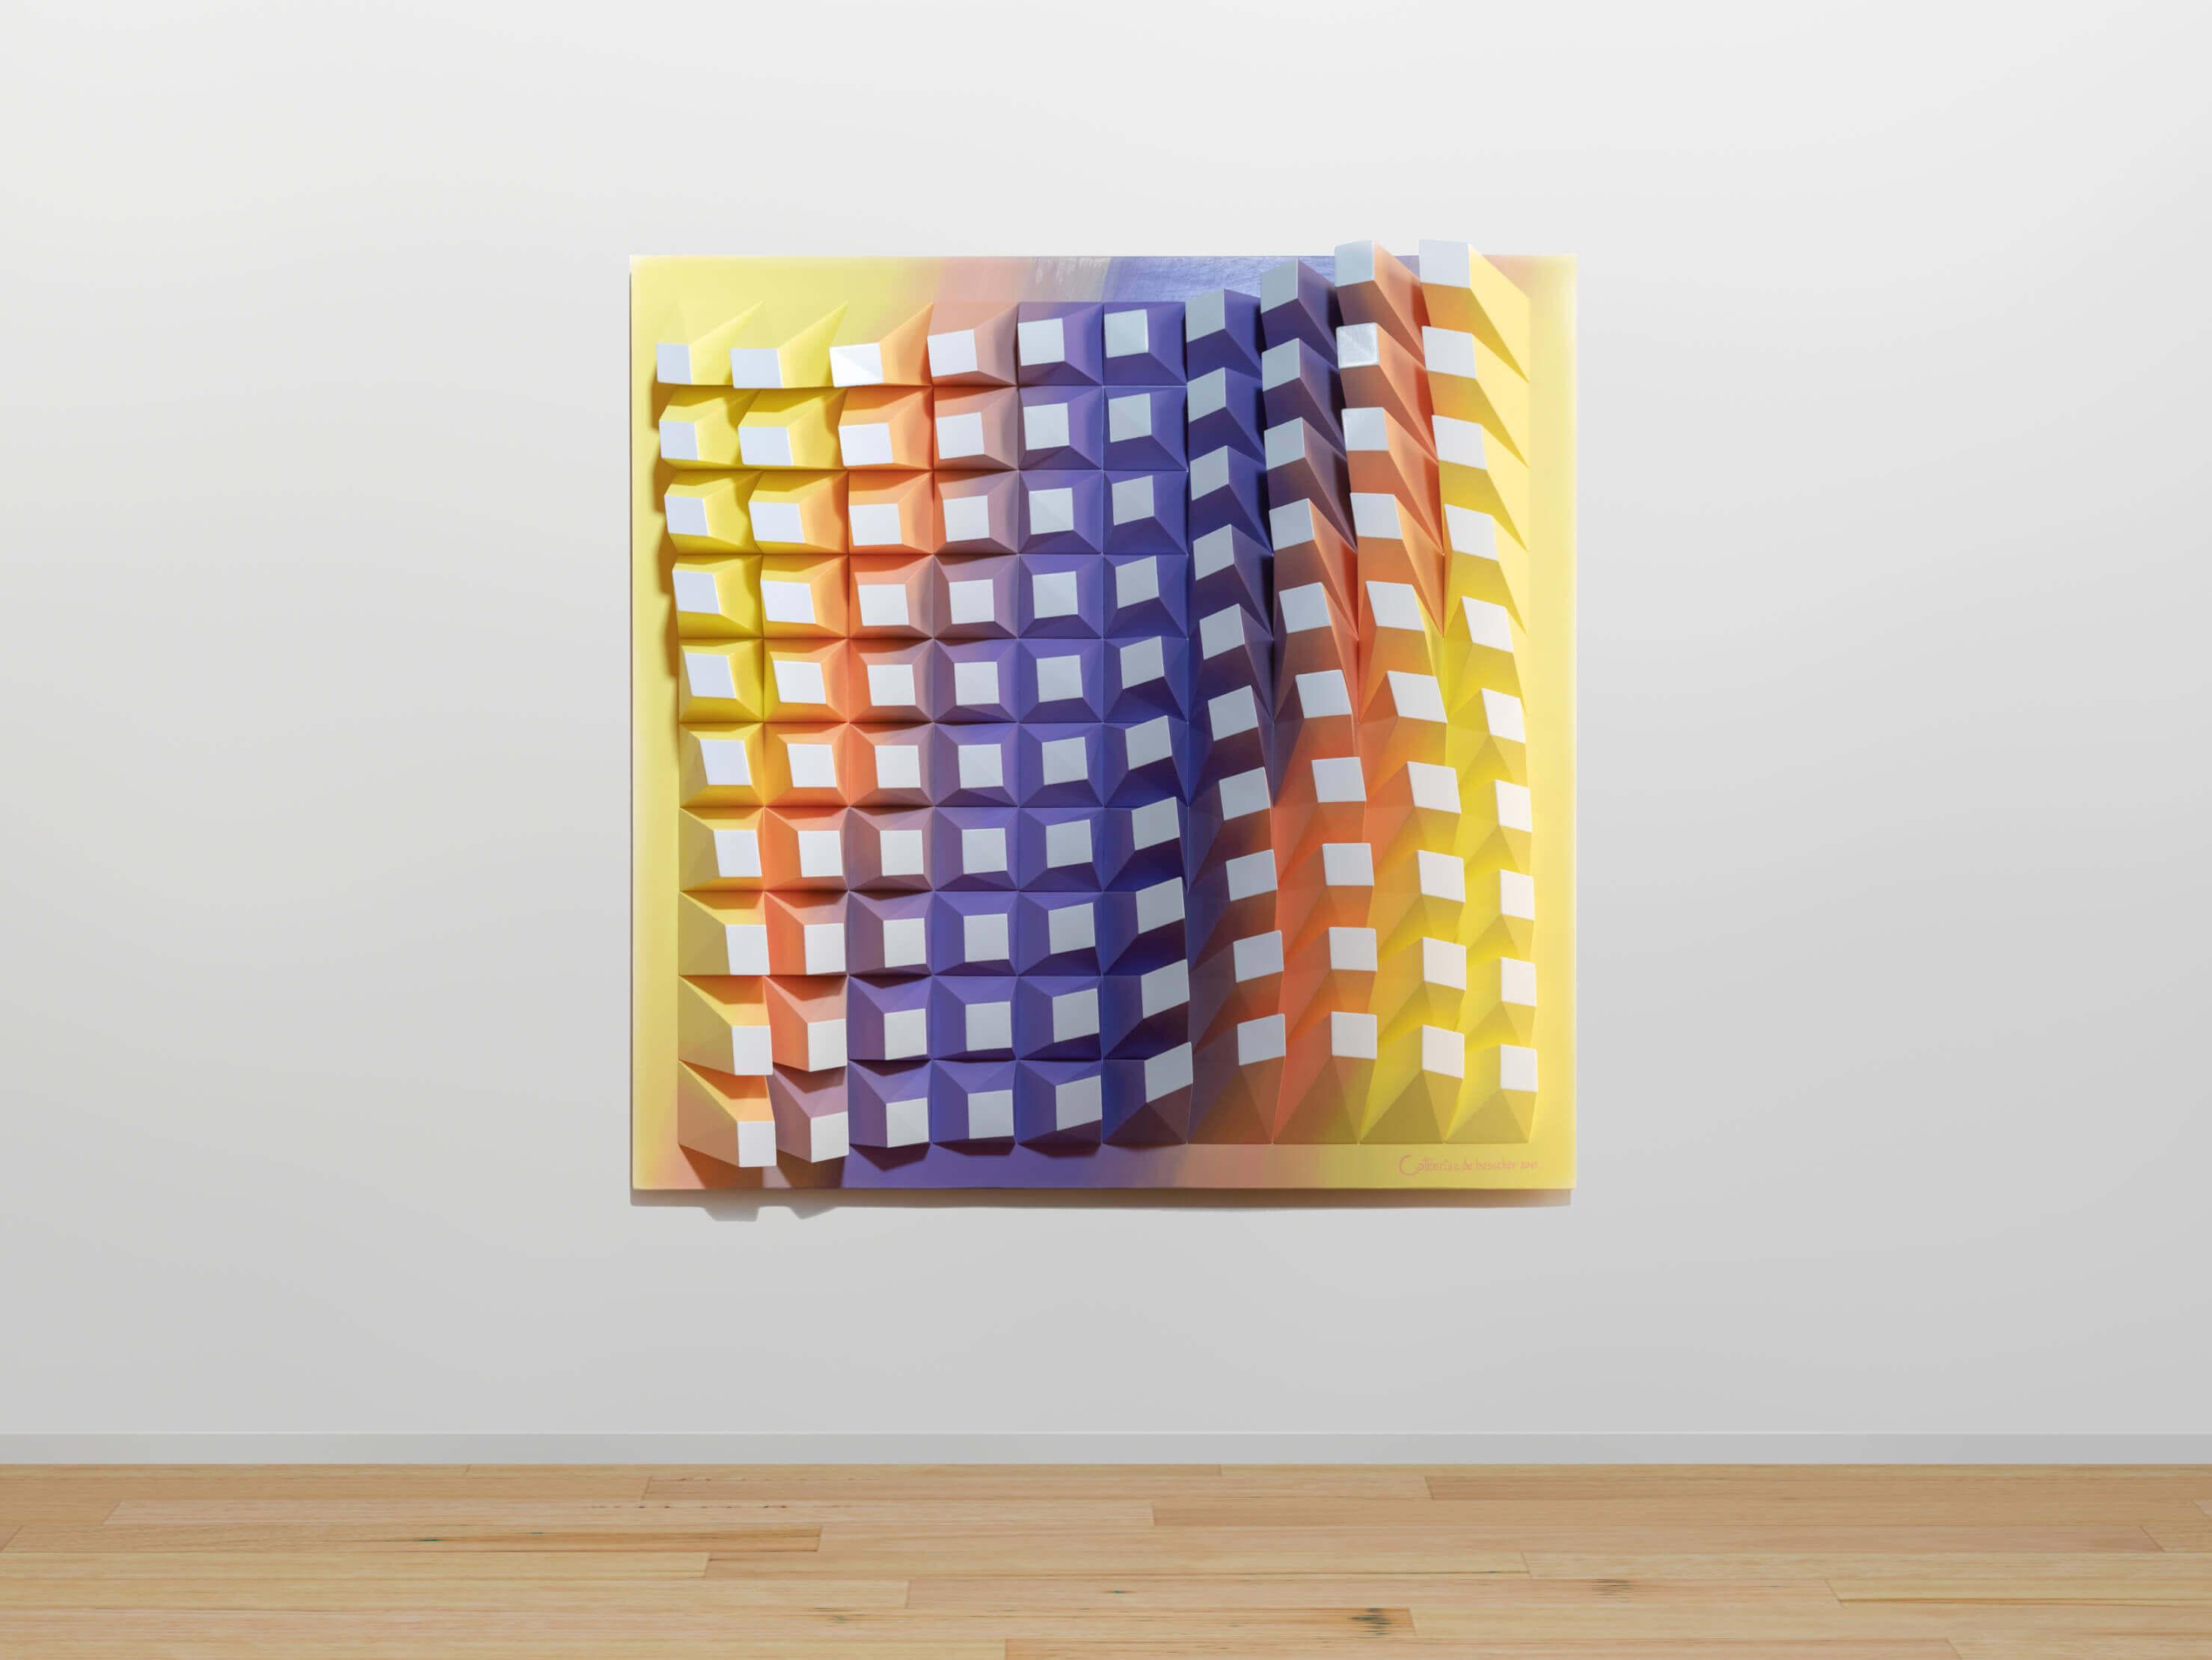 "'Matrix of Life 100' Wall Sculpture 72x72x8.5 cm/ 28.3x28.3x3.3"""